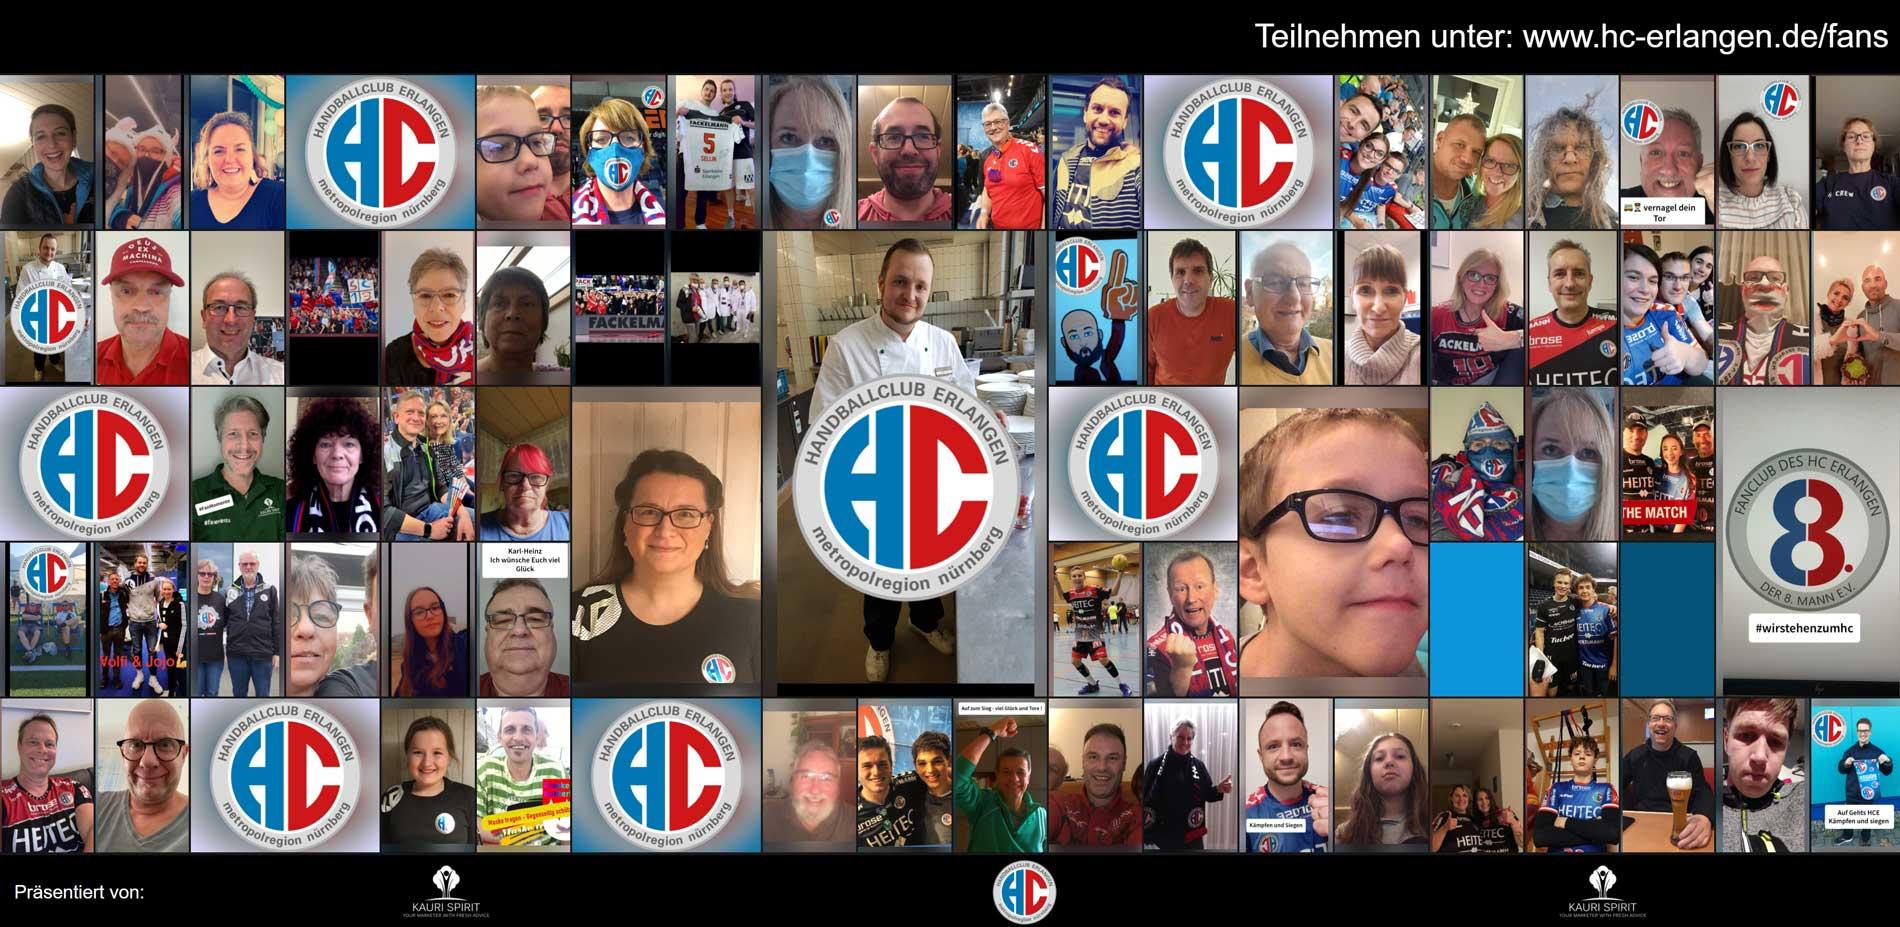 HC Erlangen vs. HWB Balingen-Weilstetten Nürnberg Fan-Collage 11.2020